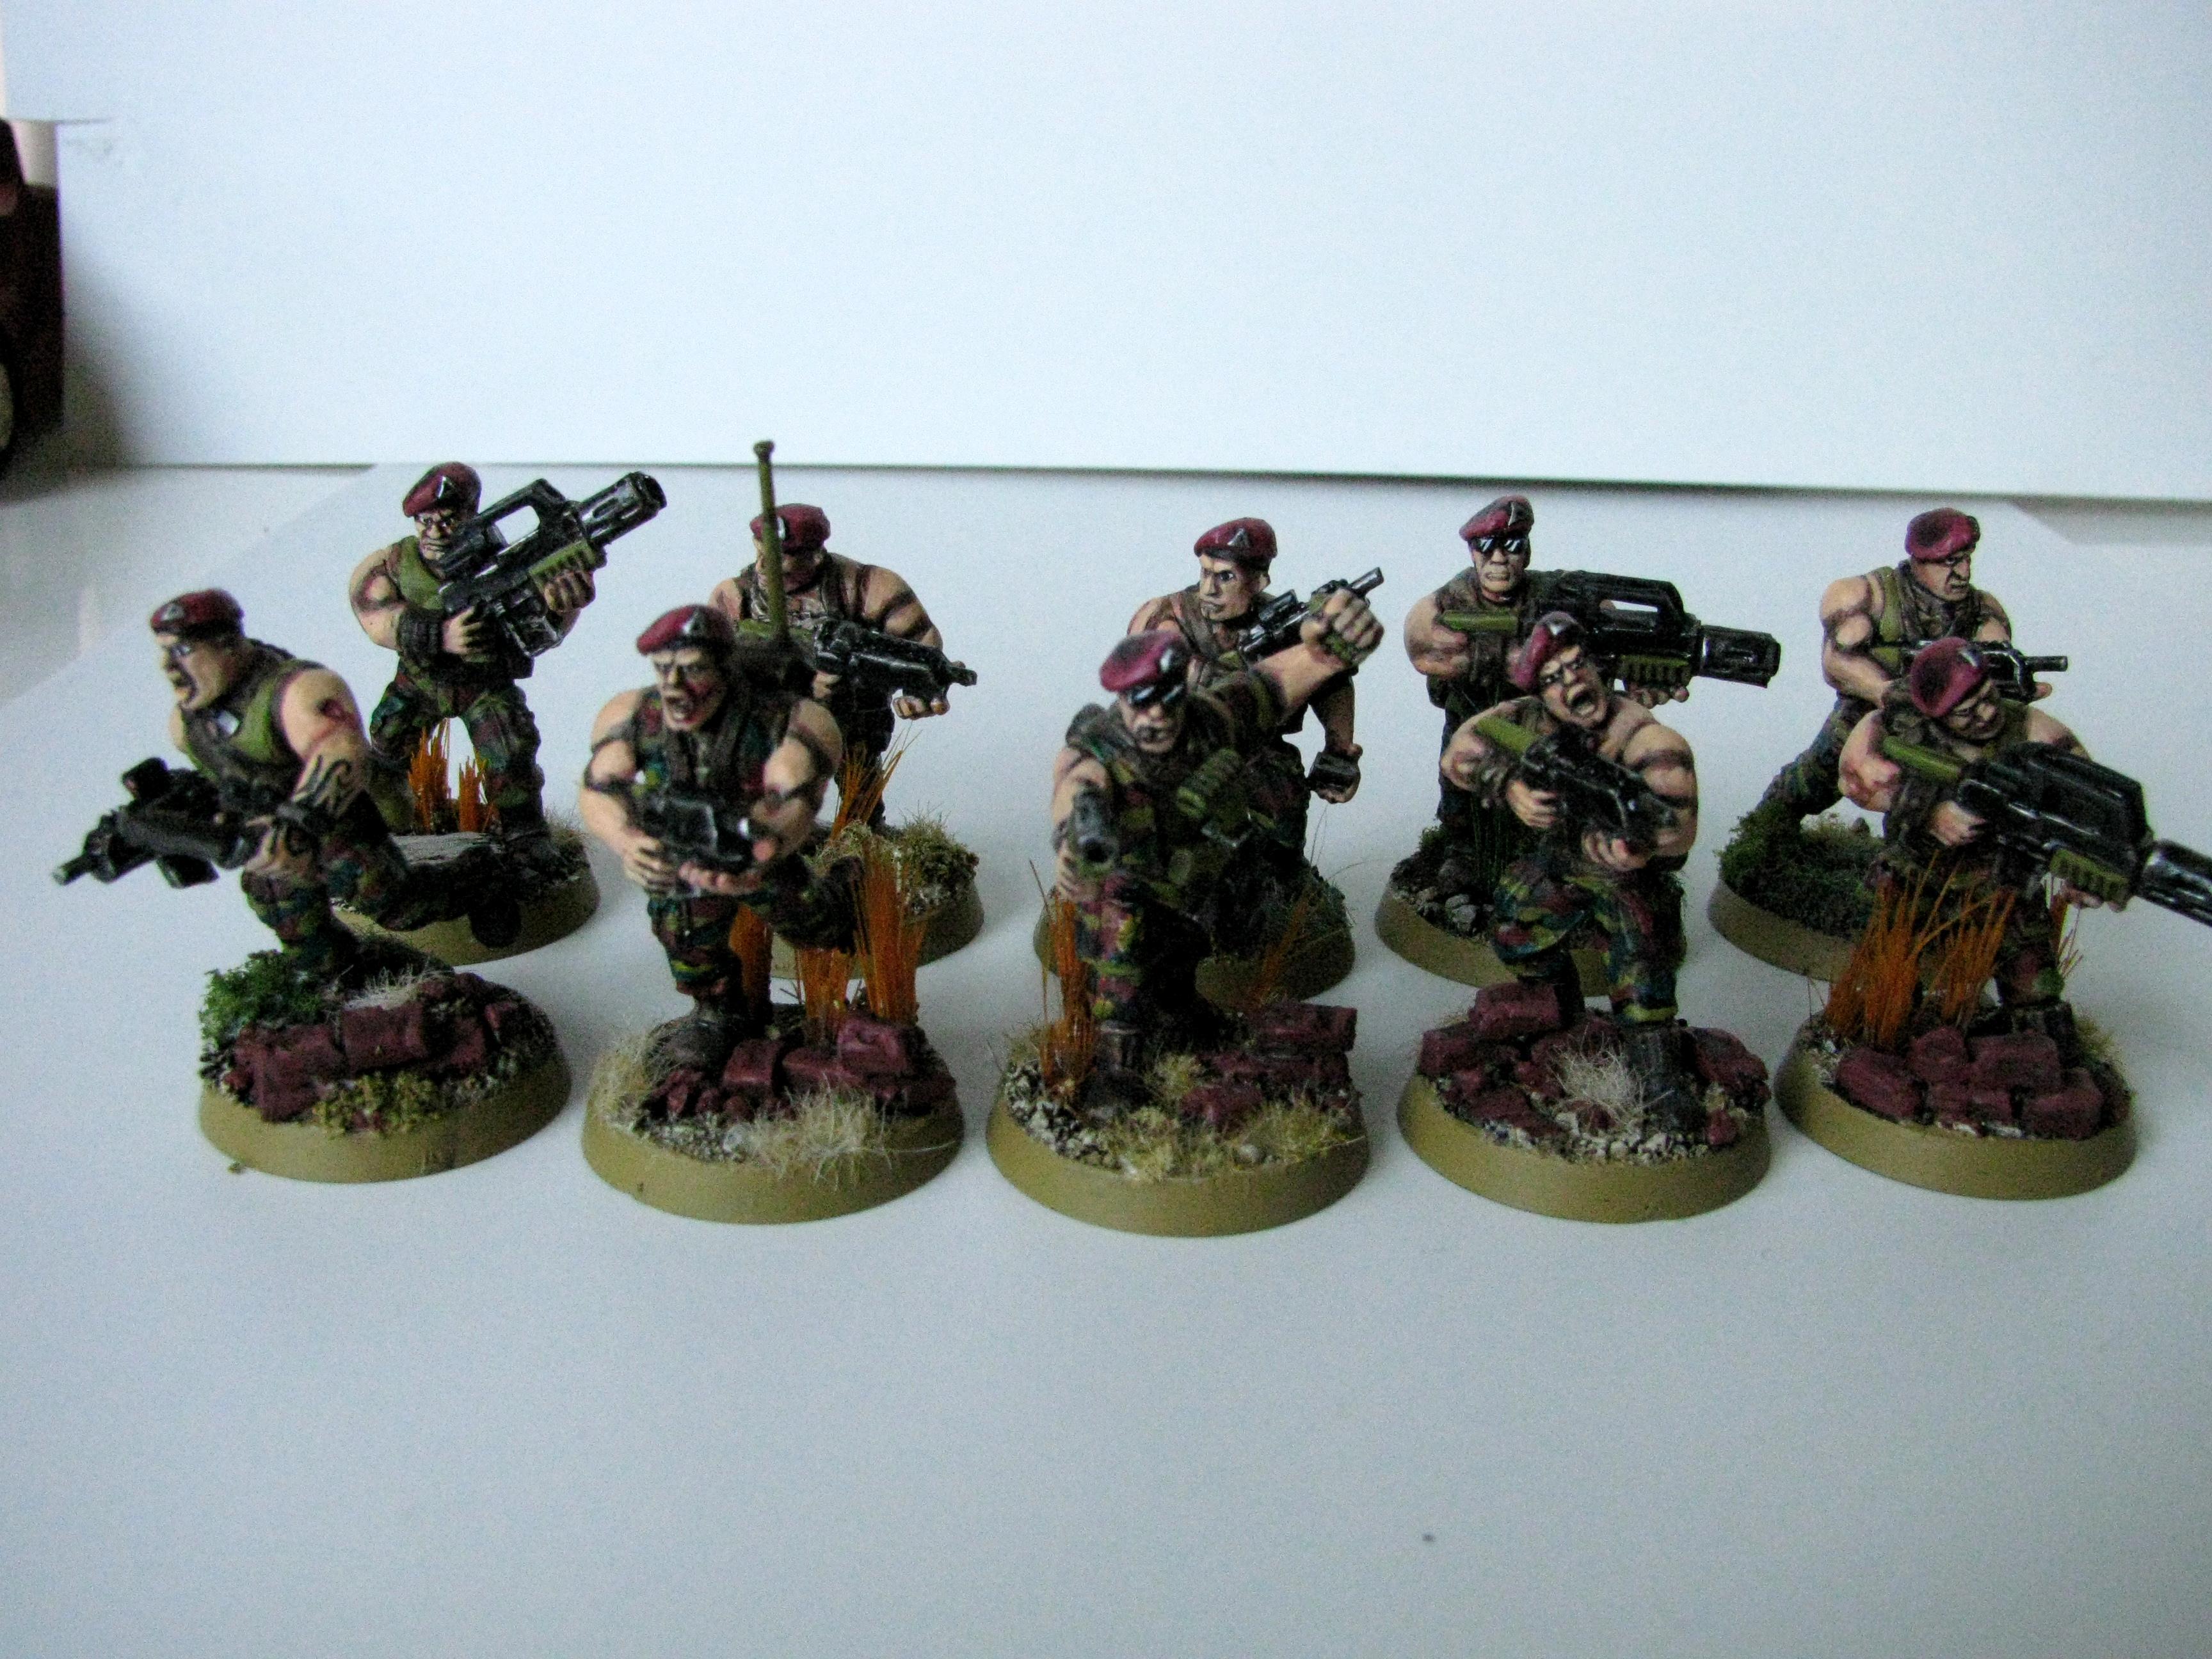 3rd, Belgium, Camouflage, Conversion, Darkon, Imperial Guard, Squad, Veteran, Warhammer 40,000, Work In Progress